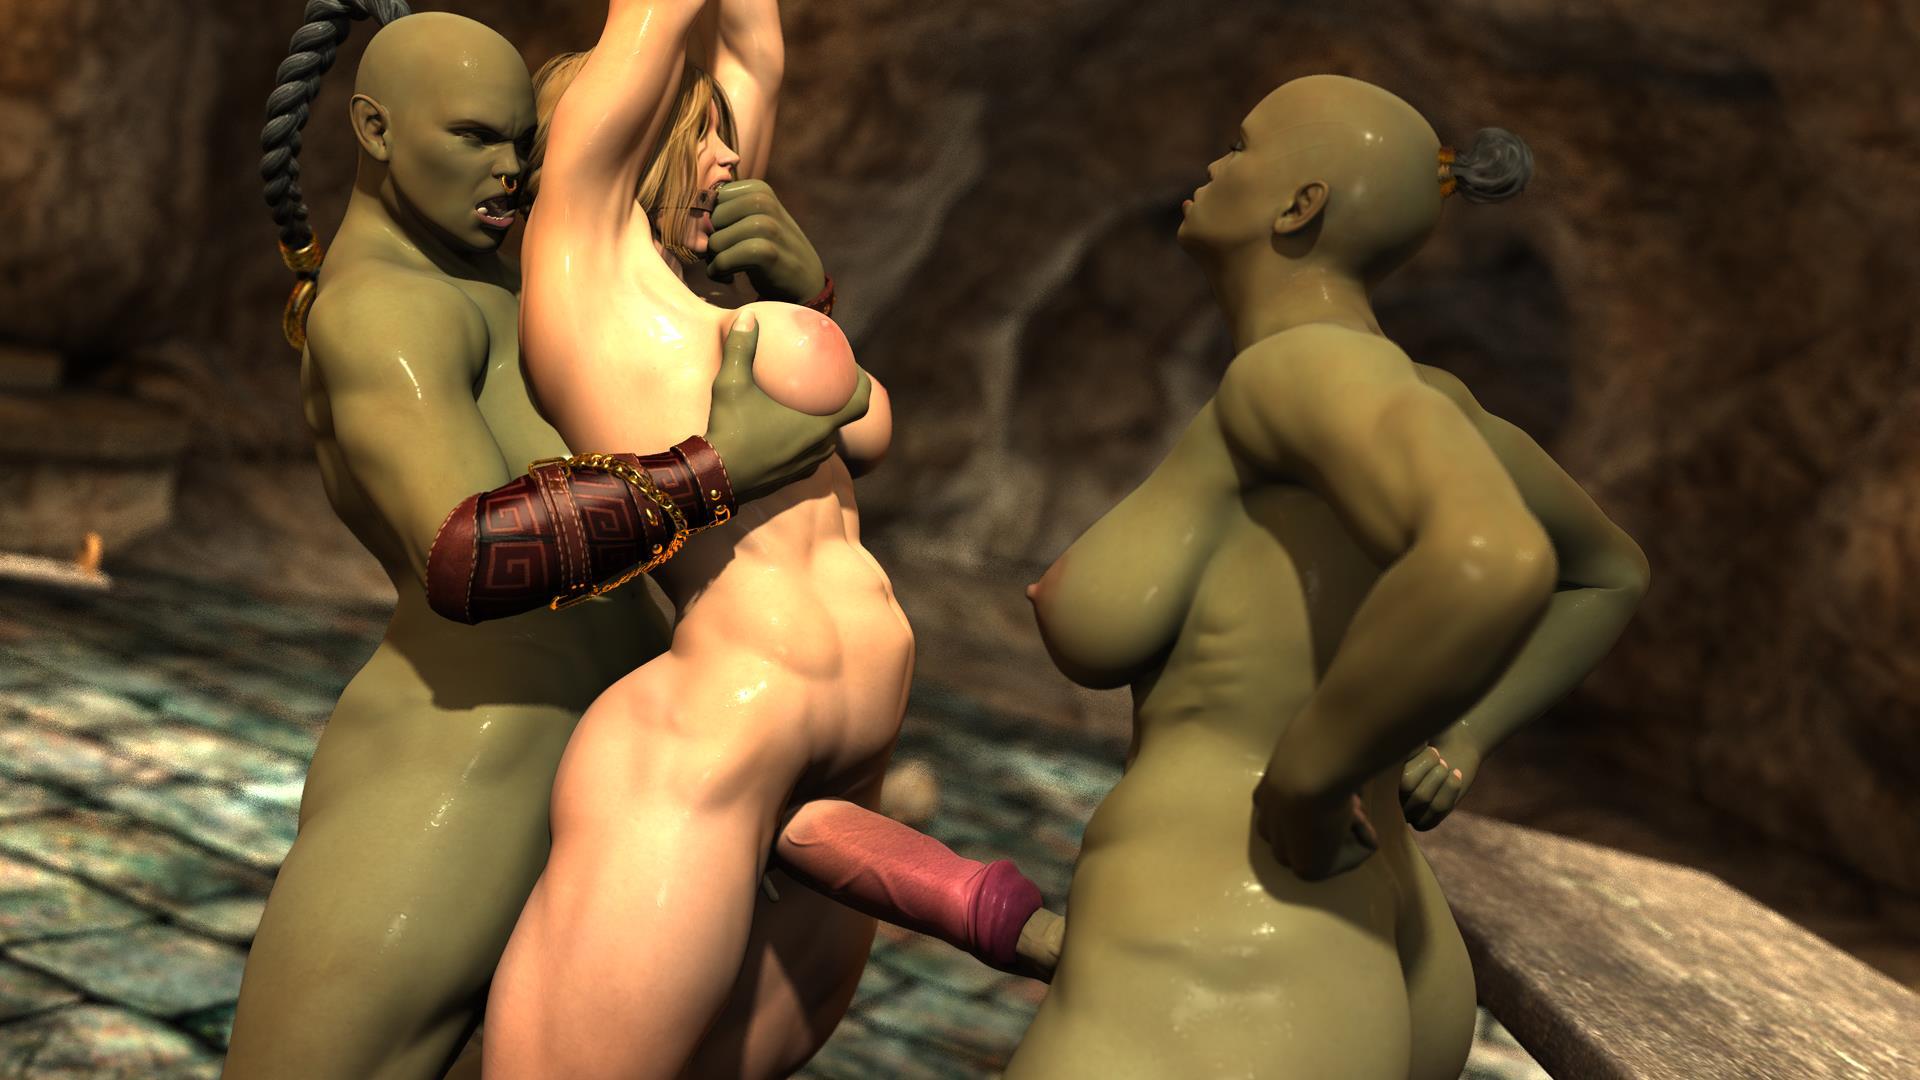 manga sex nude Anime 3d